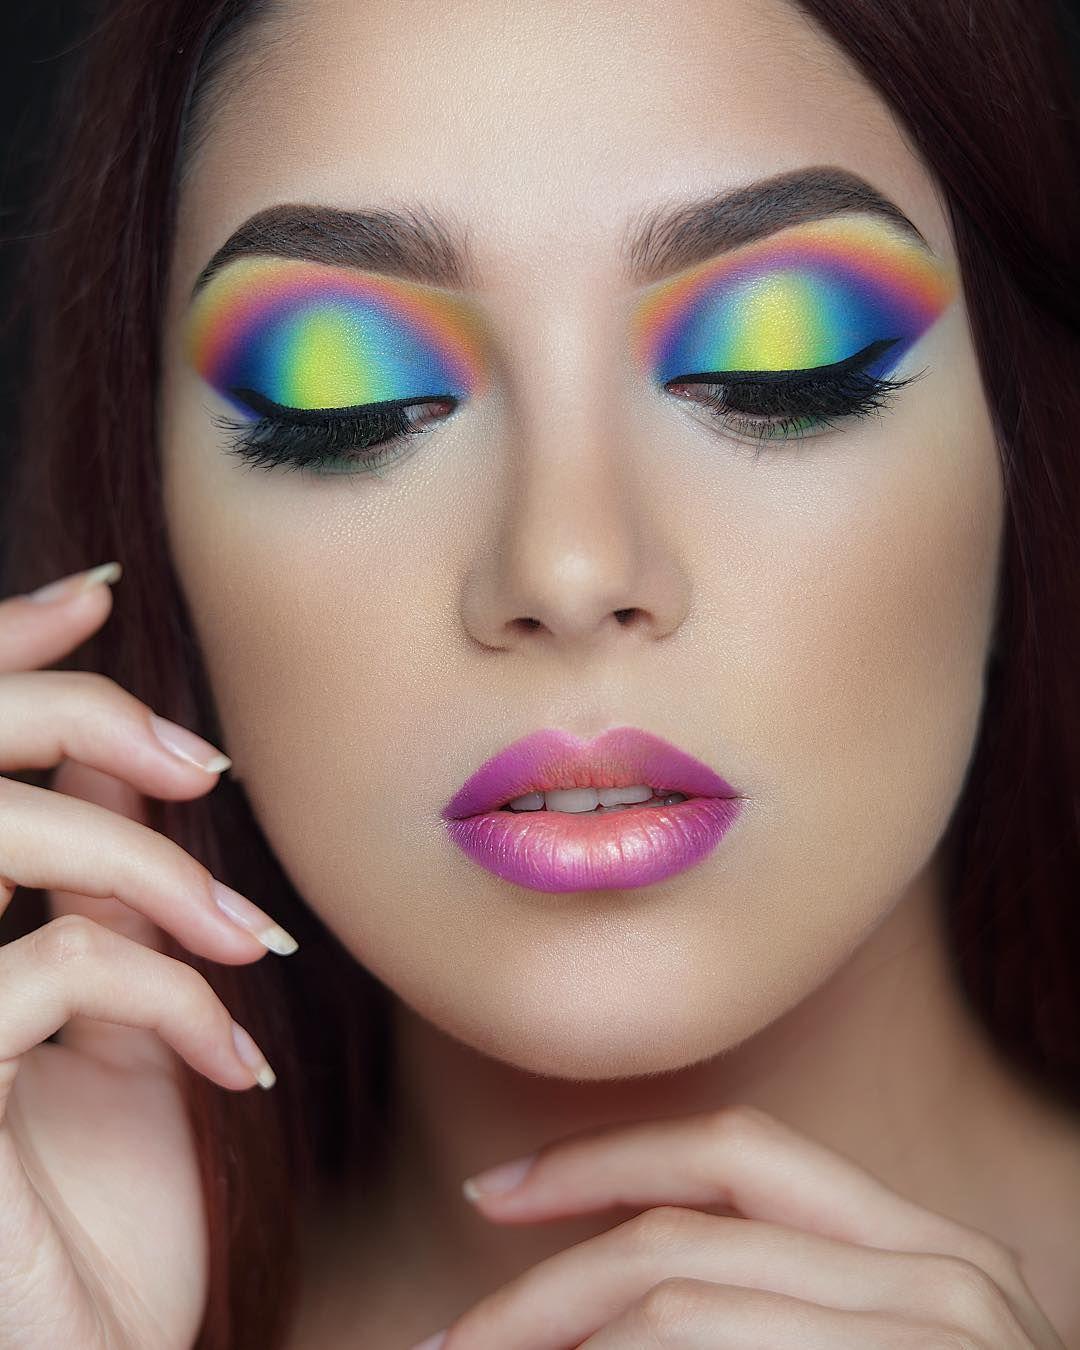 Crazy Eye Make Up: Neon Multicolor Makeup …